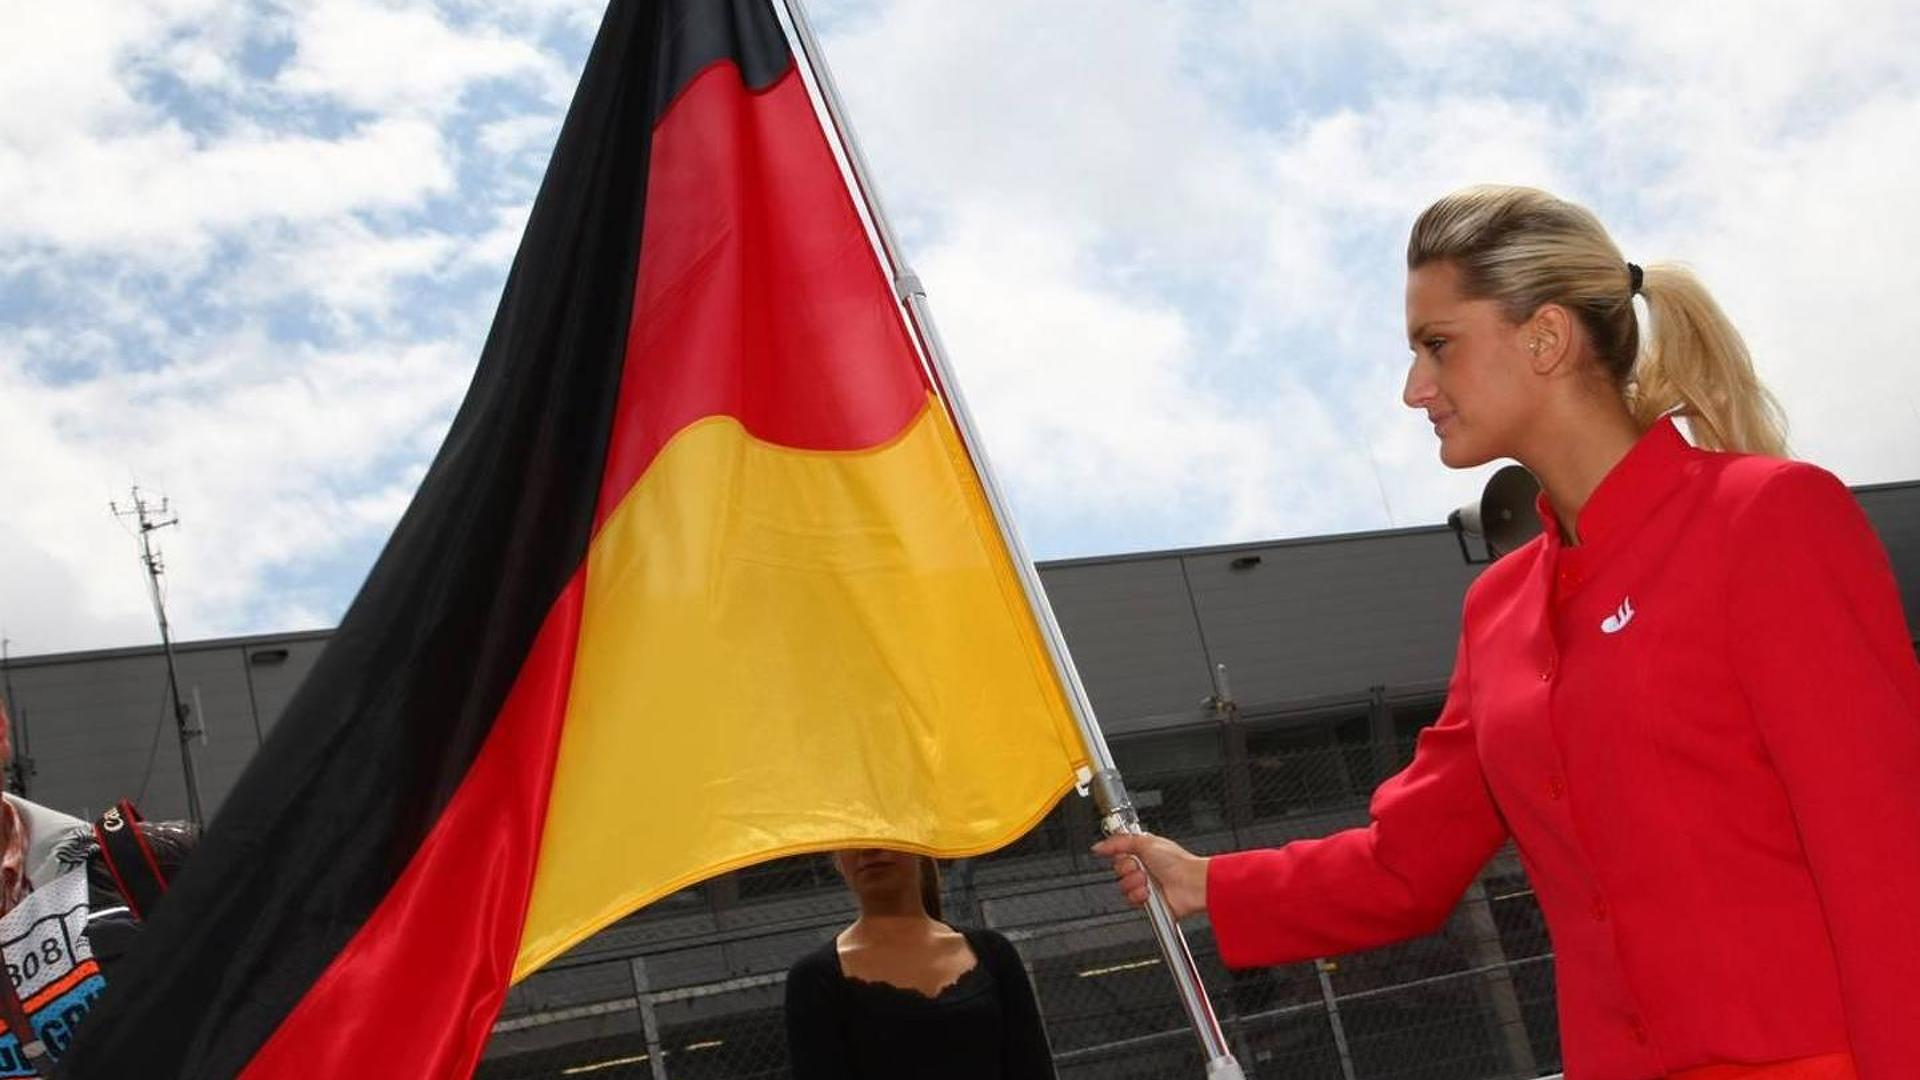 Nurburgring plays down F1 calendar exit rumours